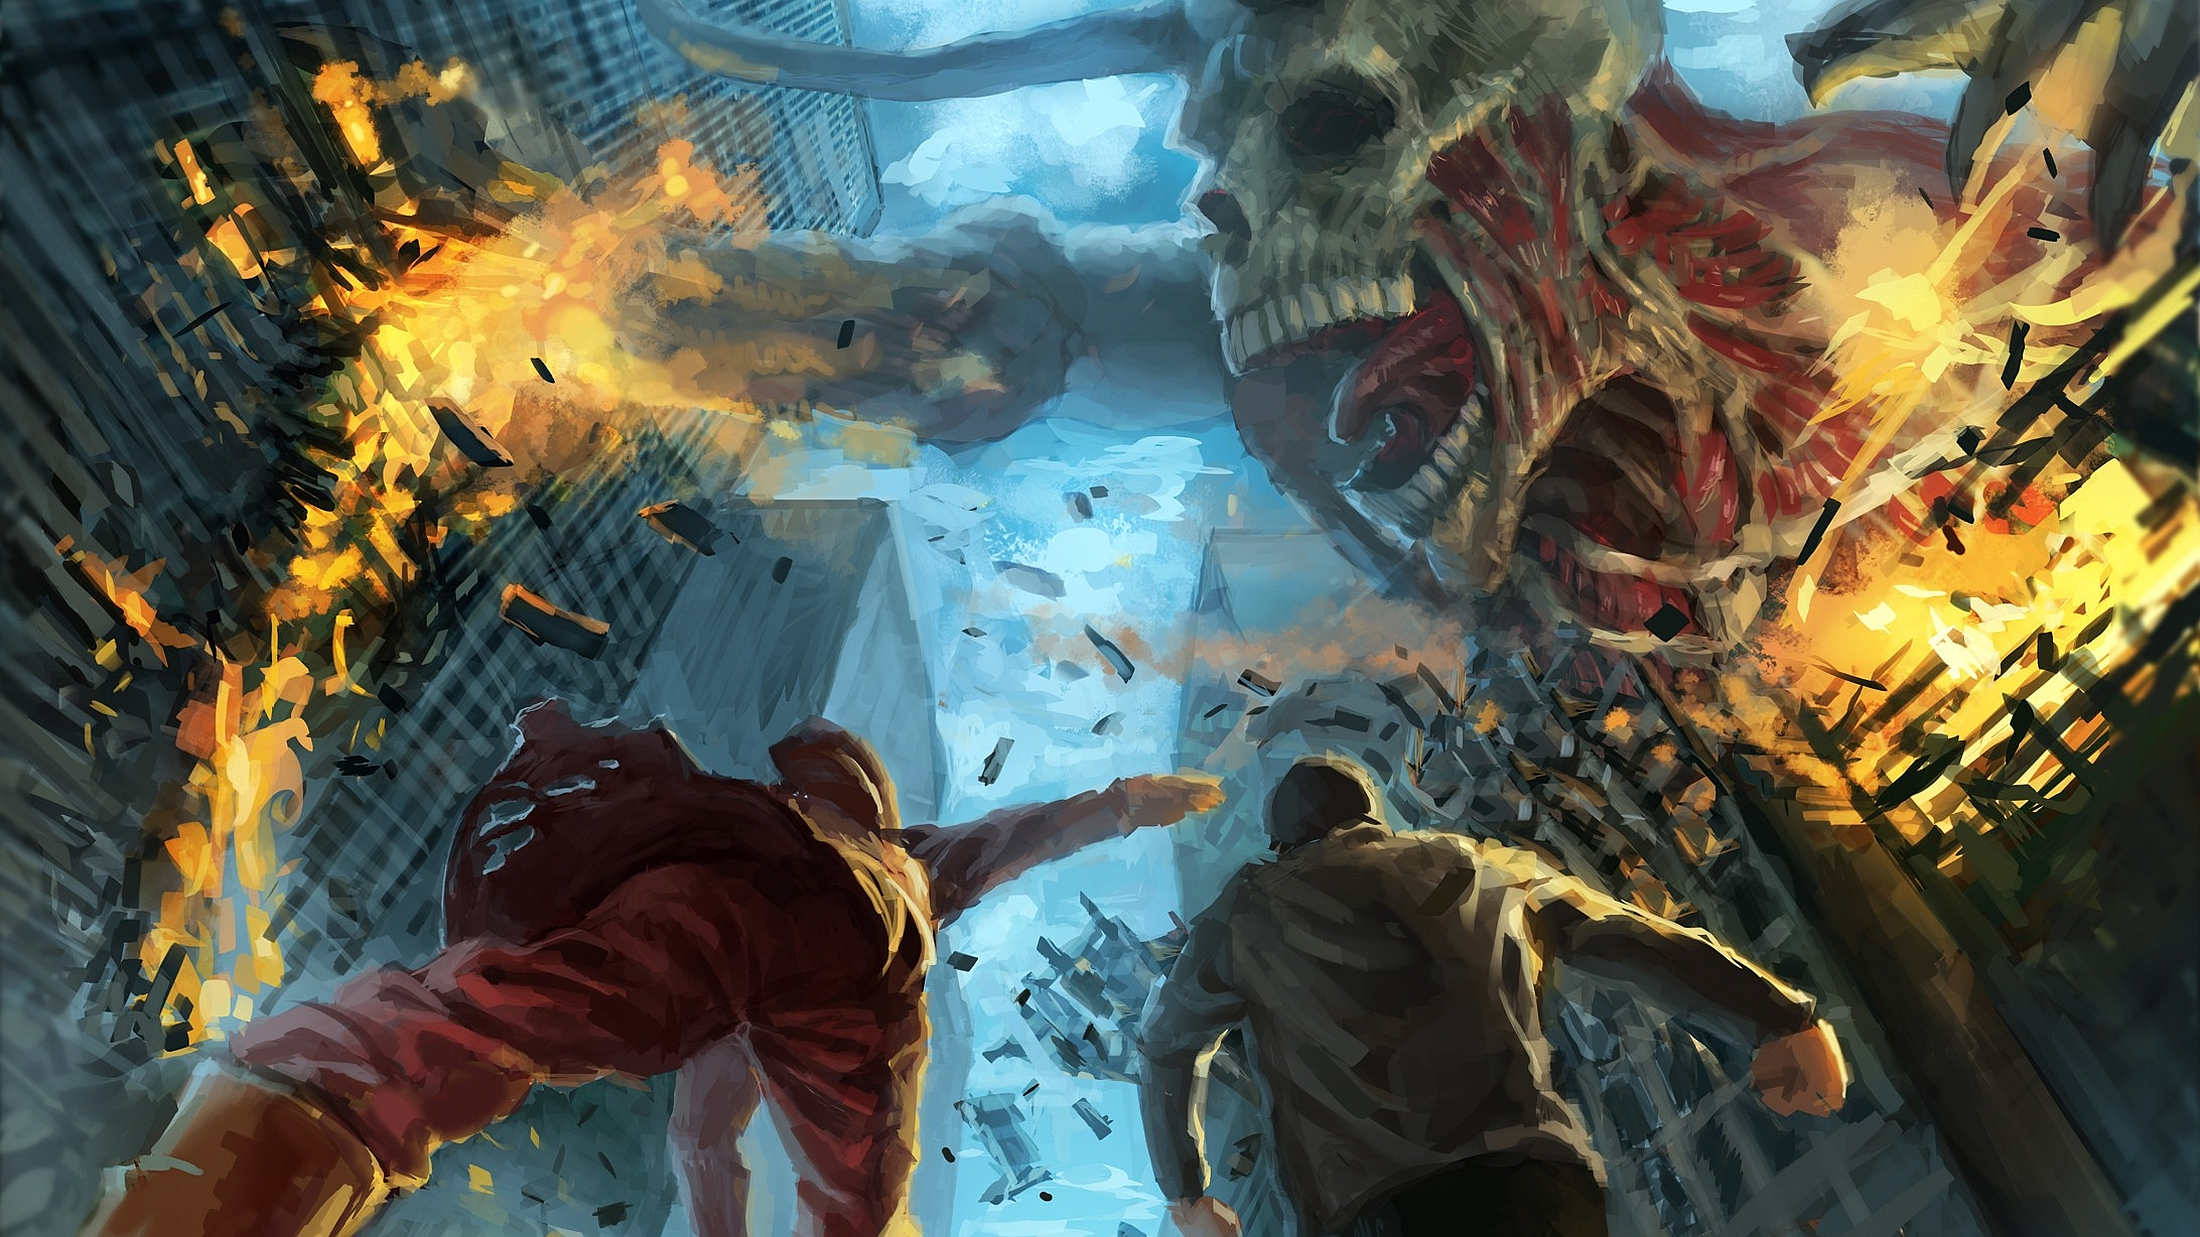 L'Attaque des Titans Fond d'écran HD   Arrière-Plan   2200x1237   ID:517949 - Wallpaper Abyss